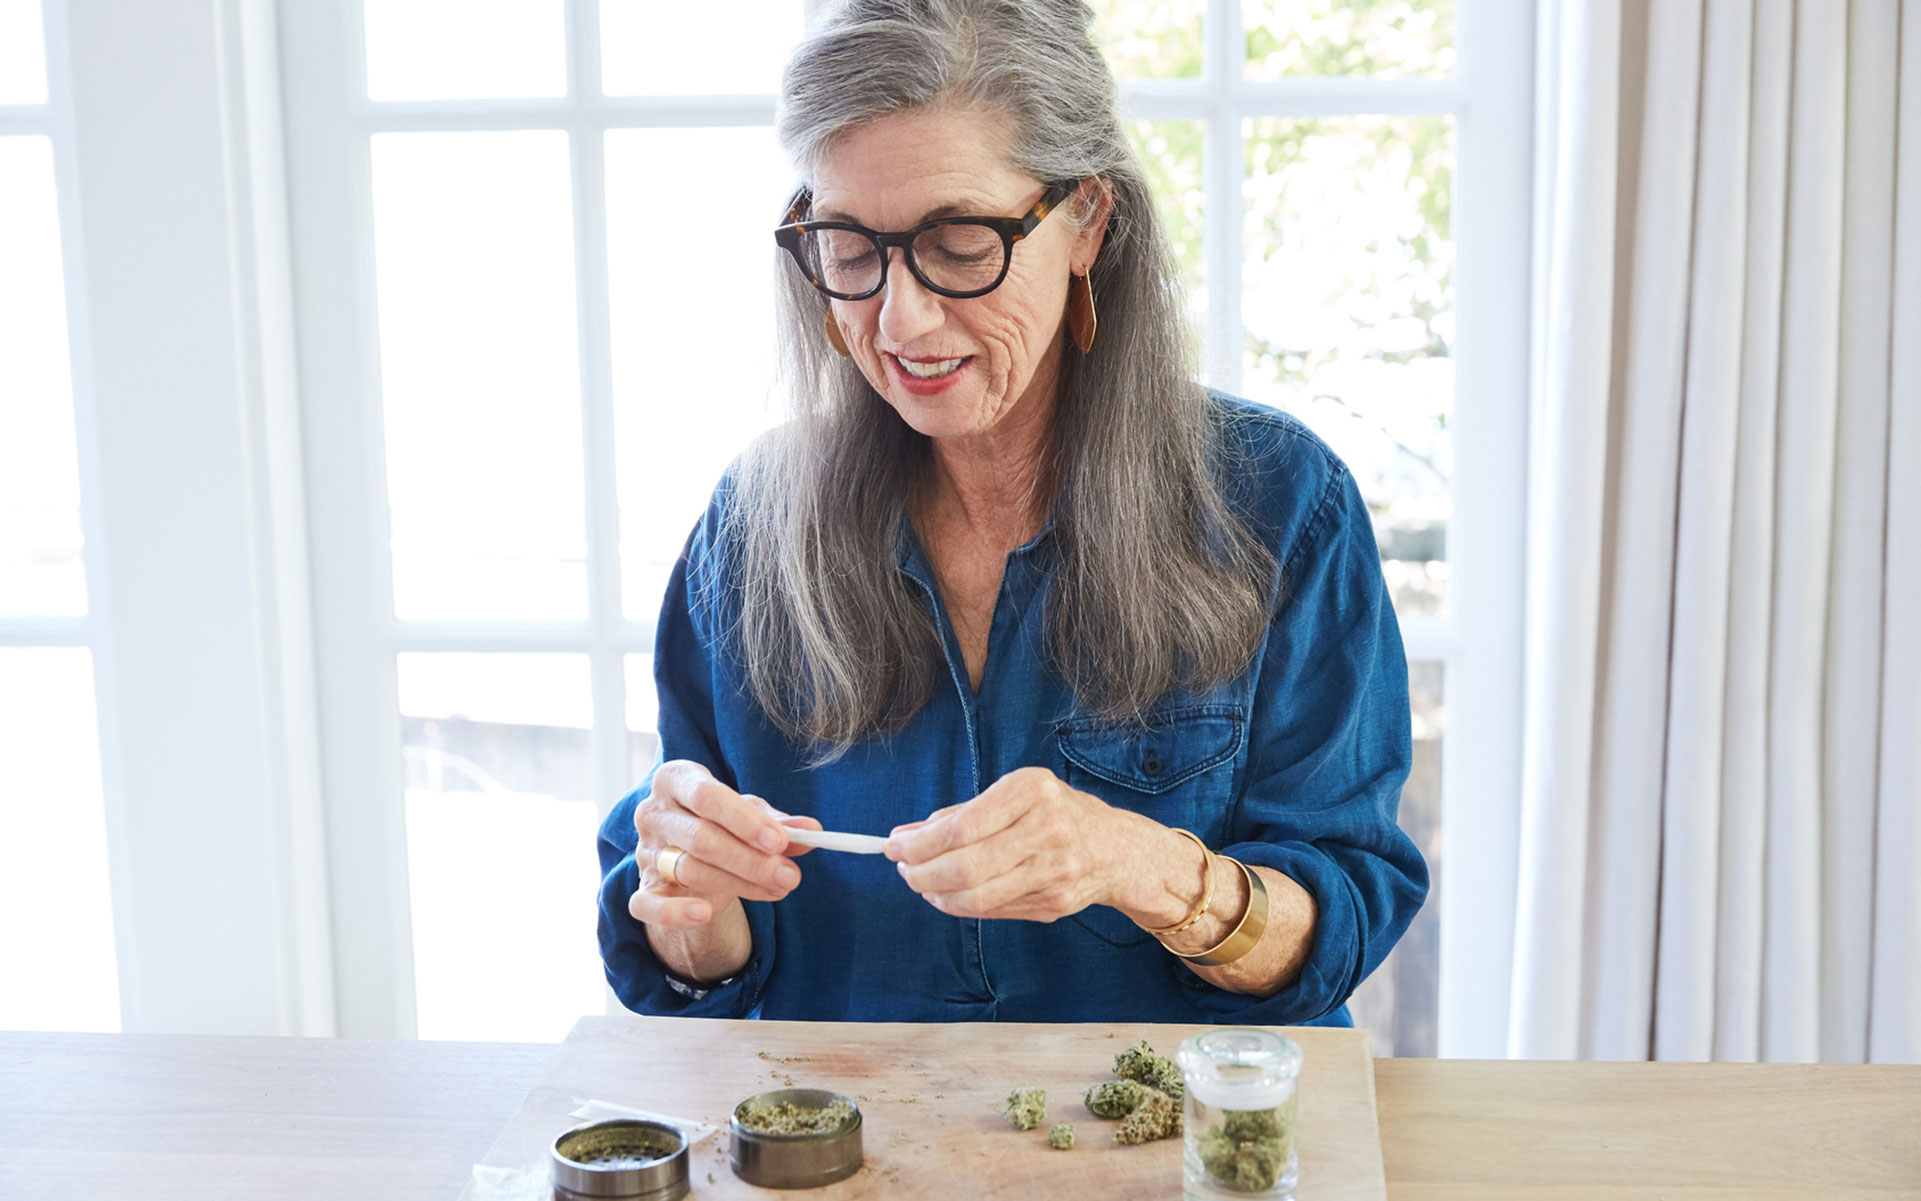 seniors enjoying cannabis, older adults consuming marijuana